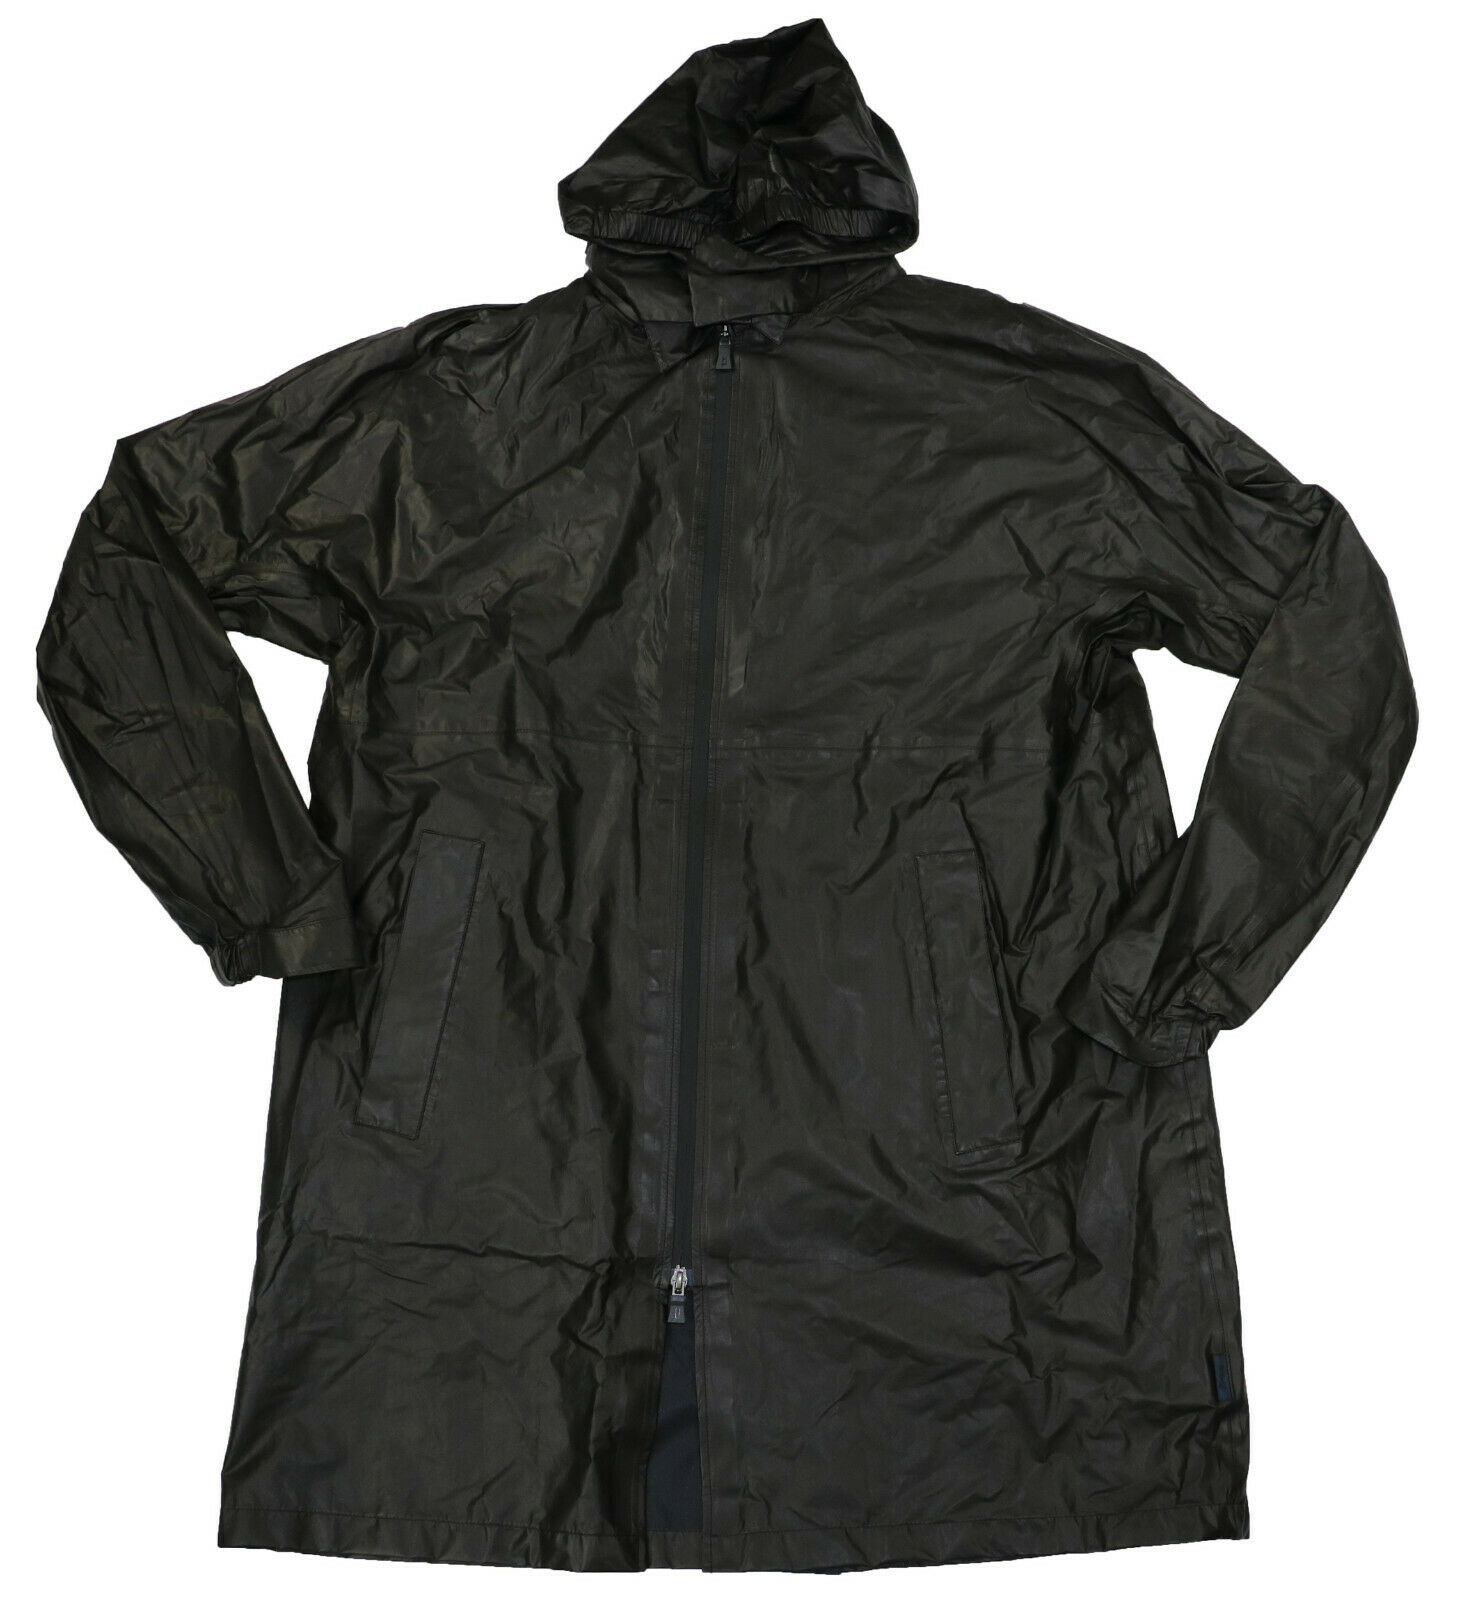 Herno Laminar Goretex Parka Style Raincoat With Hood Large/4